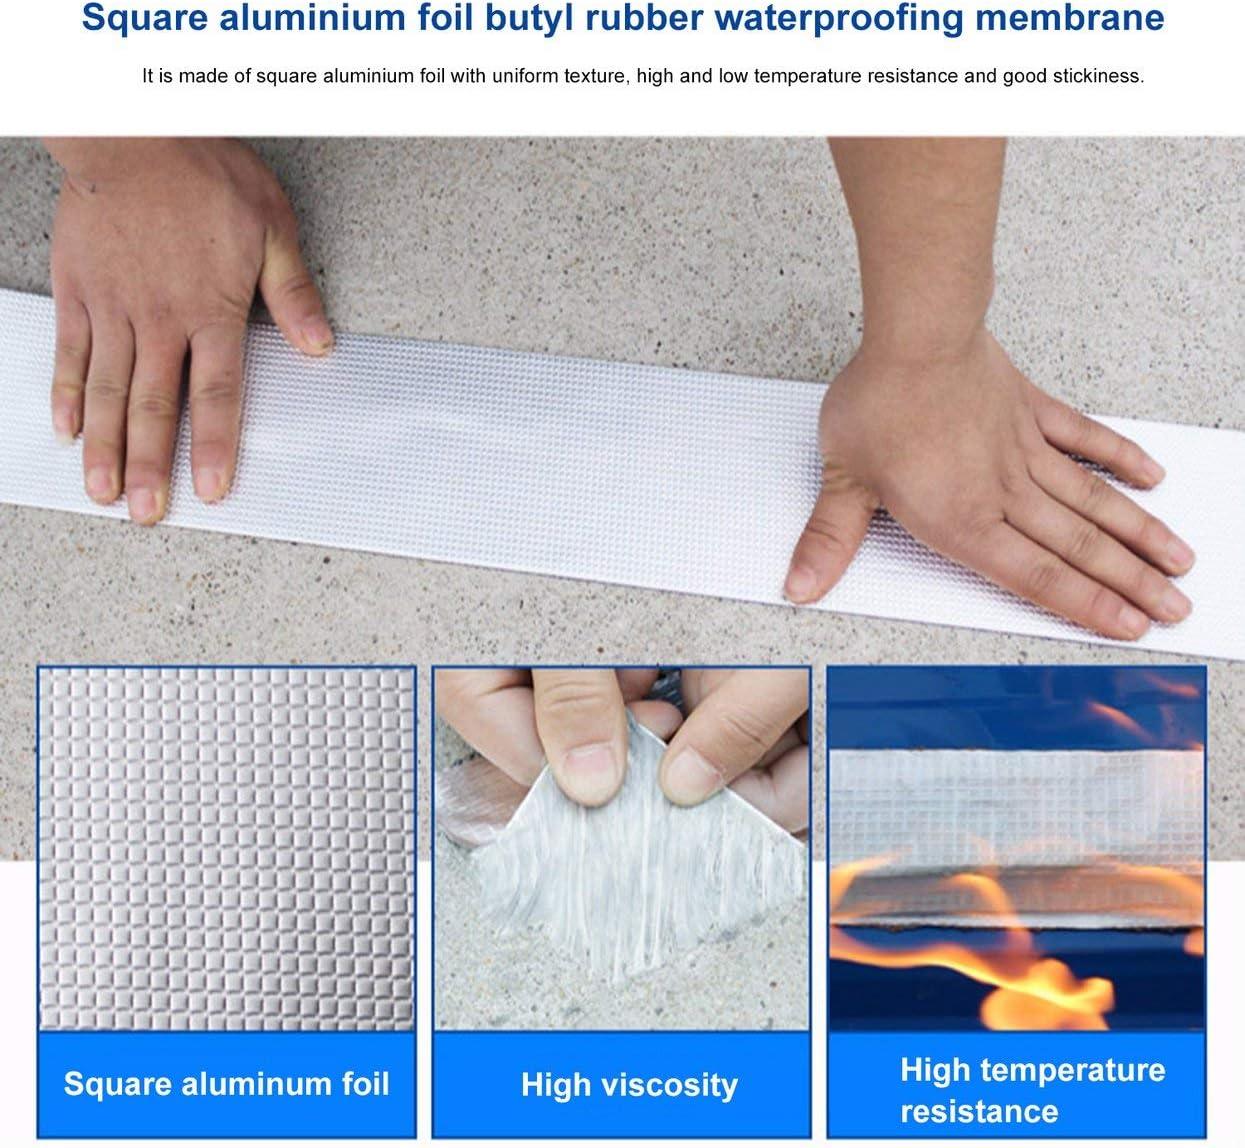 5x10cm Papel de aluminio de alta calidad Cinta de goma de butilo Tubo Vidrio Piso Techo Ventana Pared Impermeable Sellador adhesivo 1.5 mm de espesor Plata